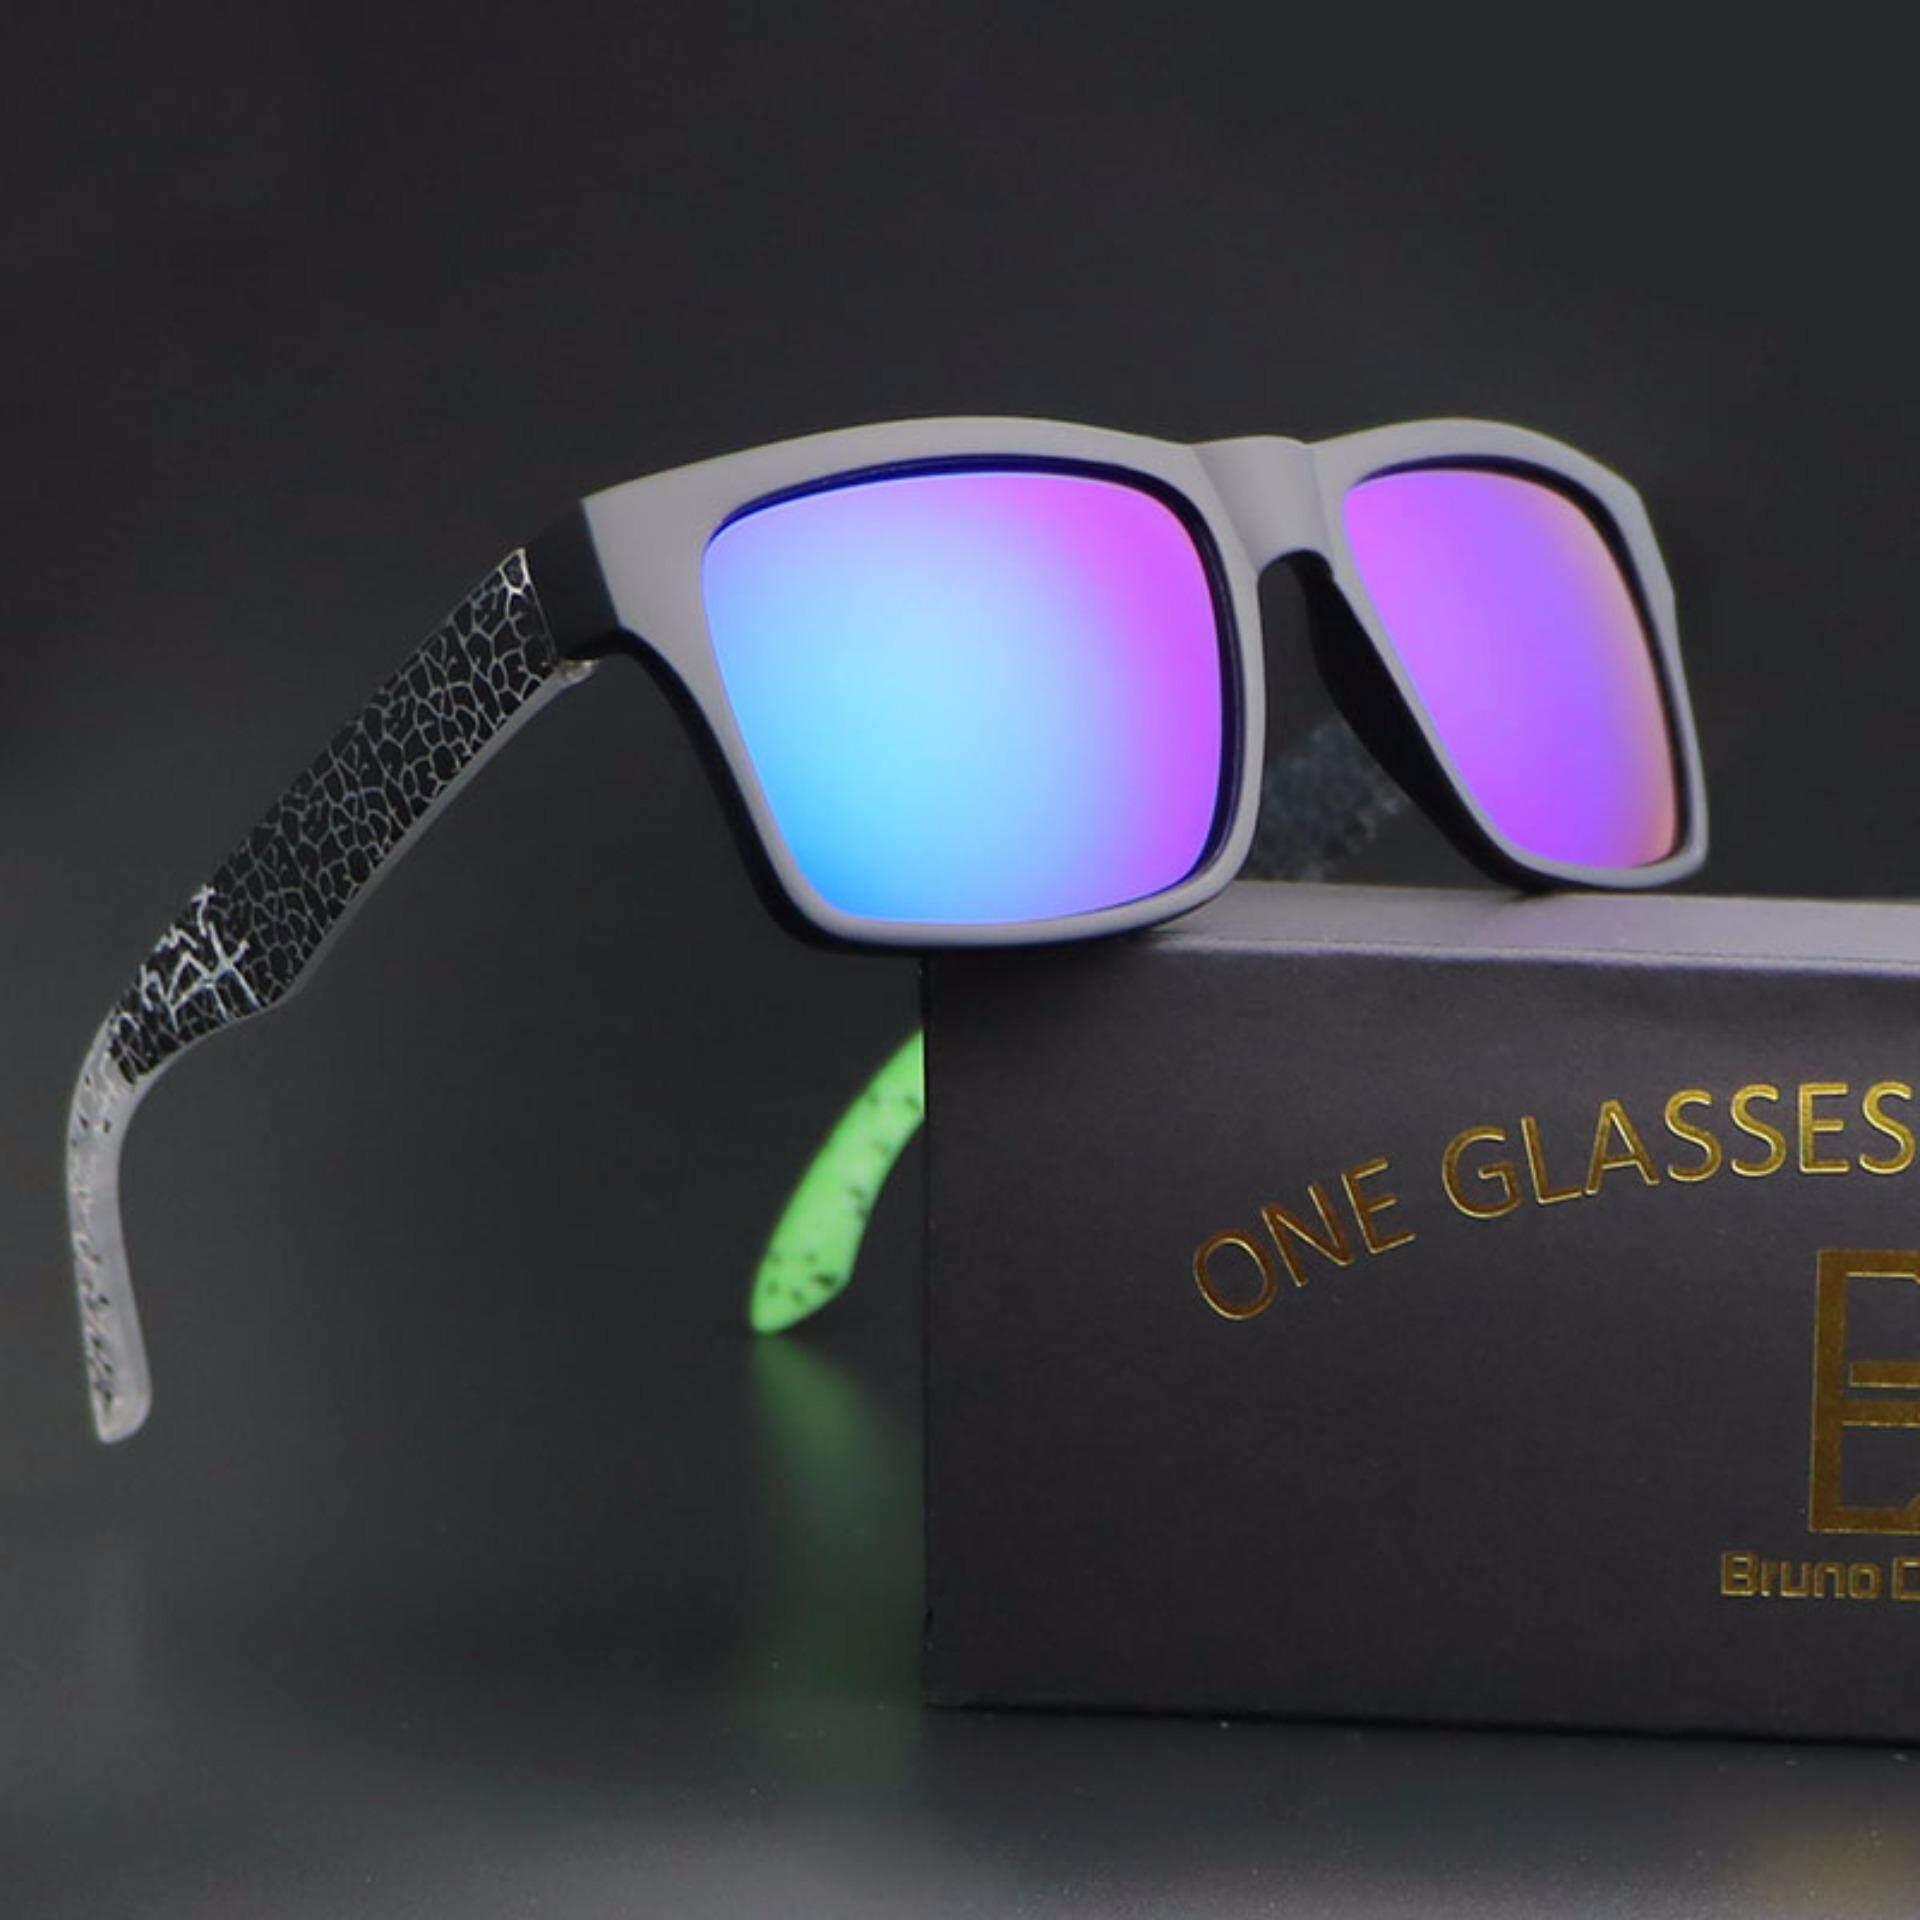 WY Ting 2018 Baru Bingkai Hijau Hijau Kacamata Hitam Lensa Pria Wanita Olahraga Kacamata Hitam Helm